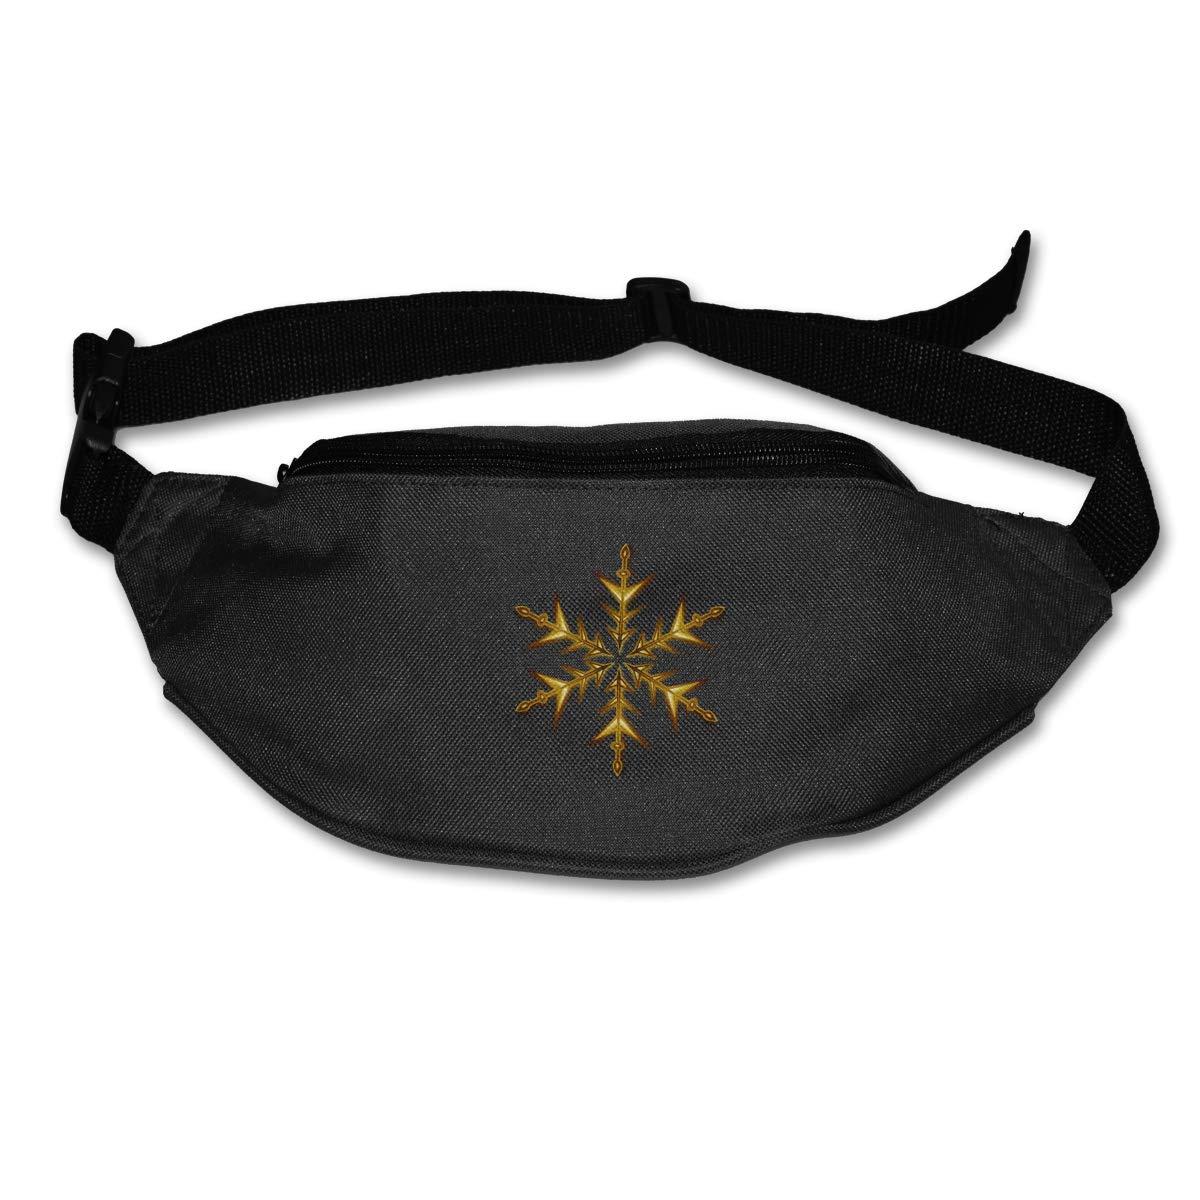 Gold Snowflake Sport Waist Packs Fanny Pack Adjustable For Run